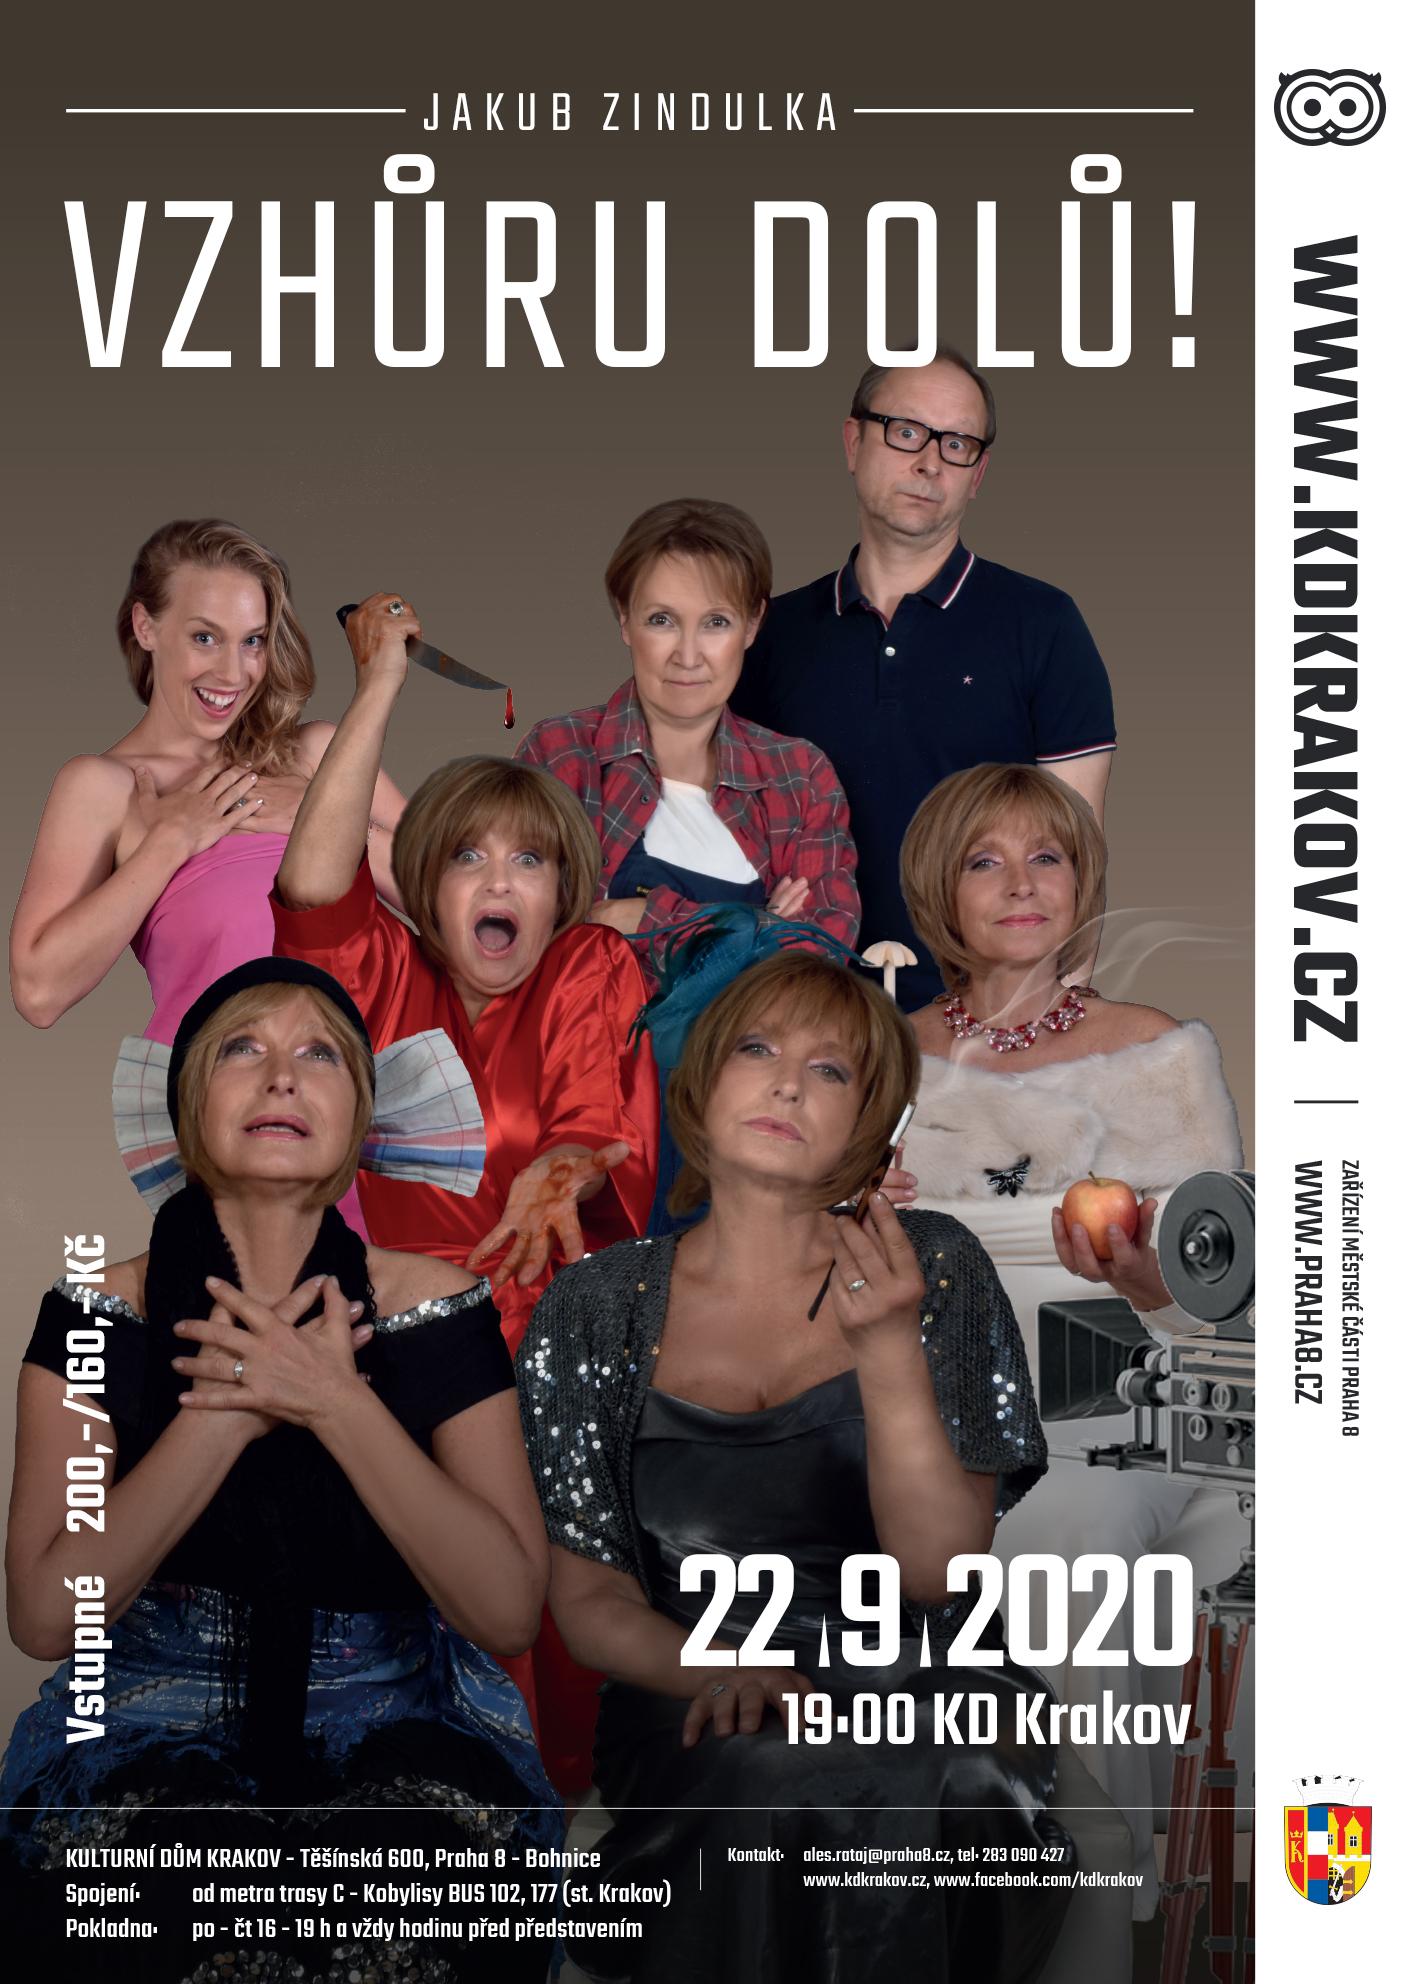 Mc Praha 8 Kalendar Akci Vzhuru Dolu